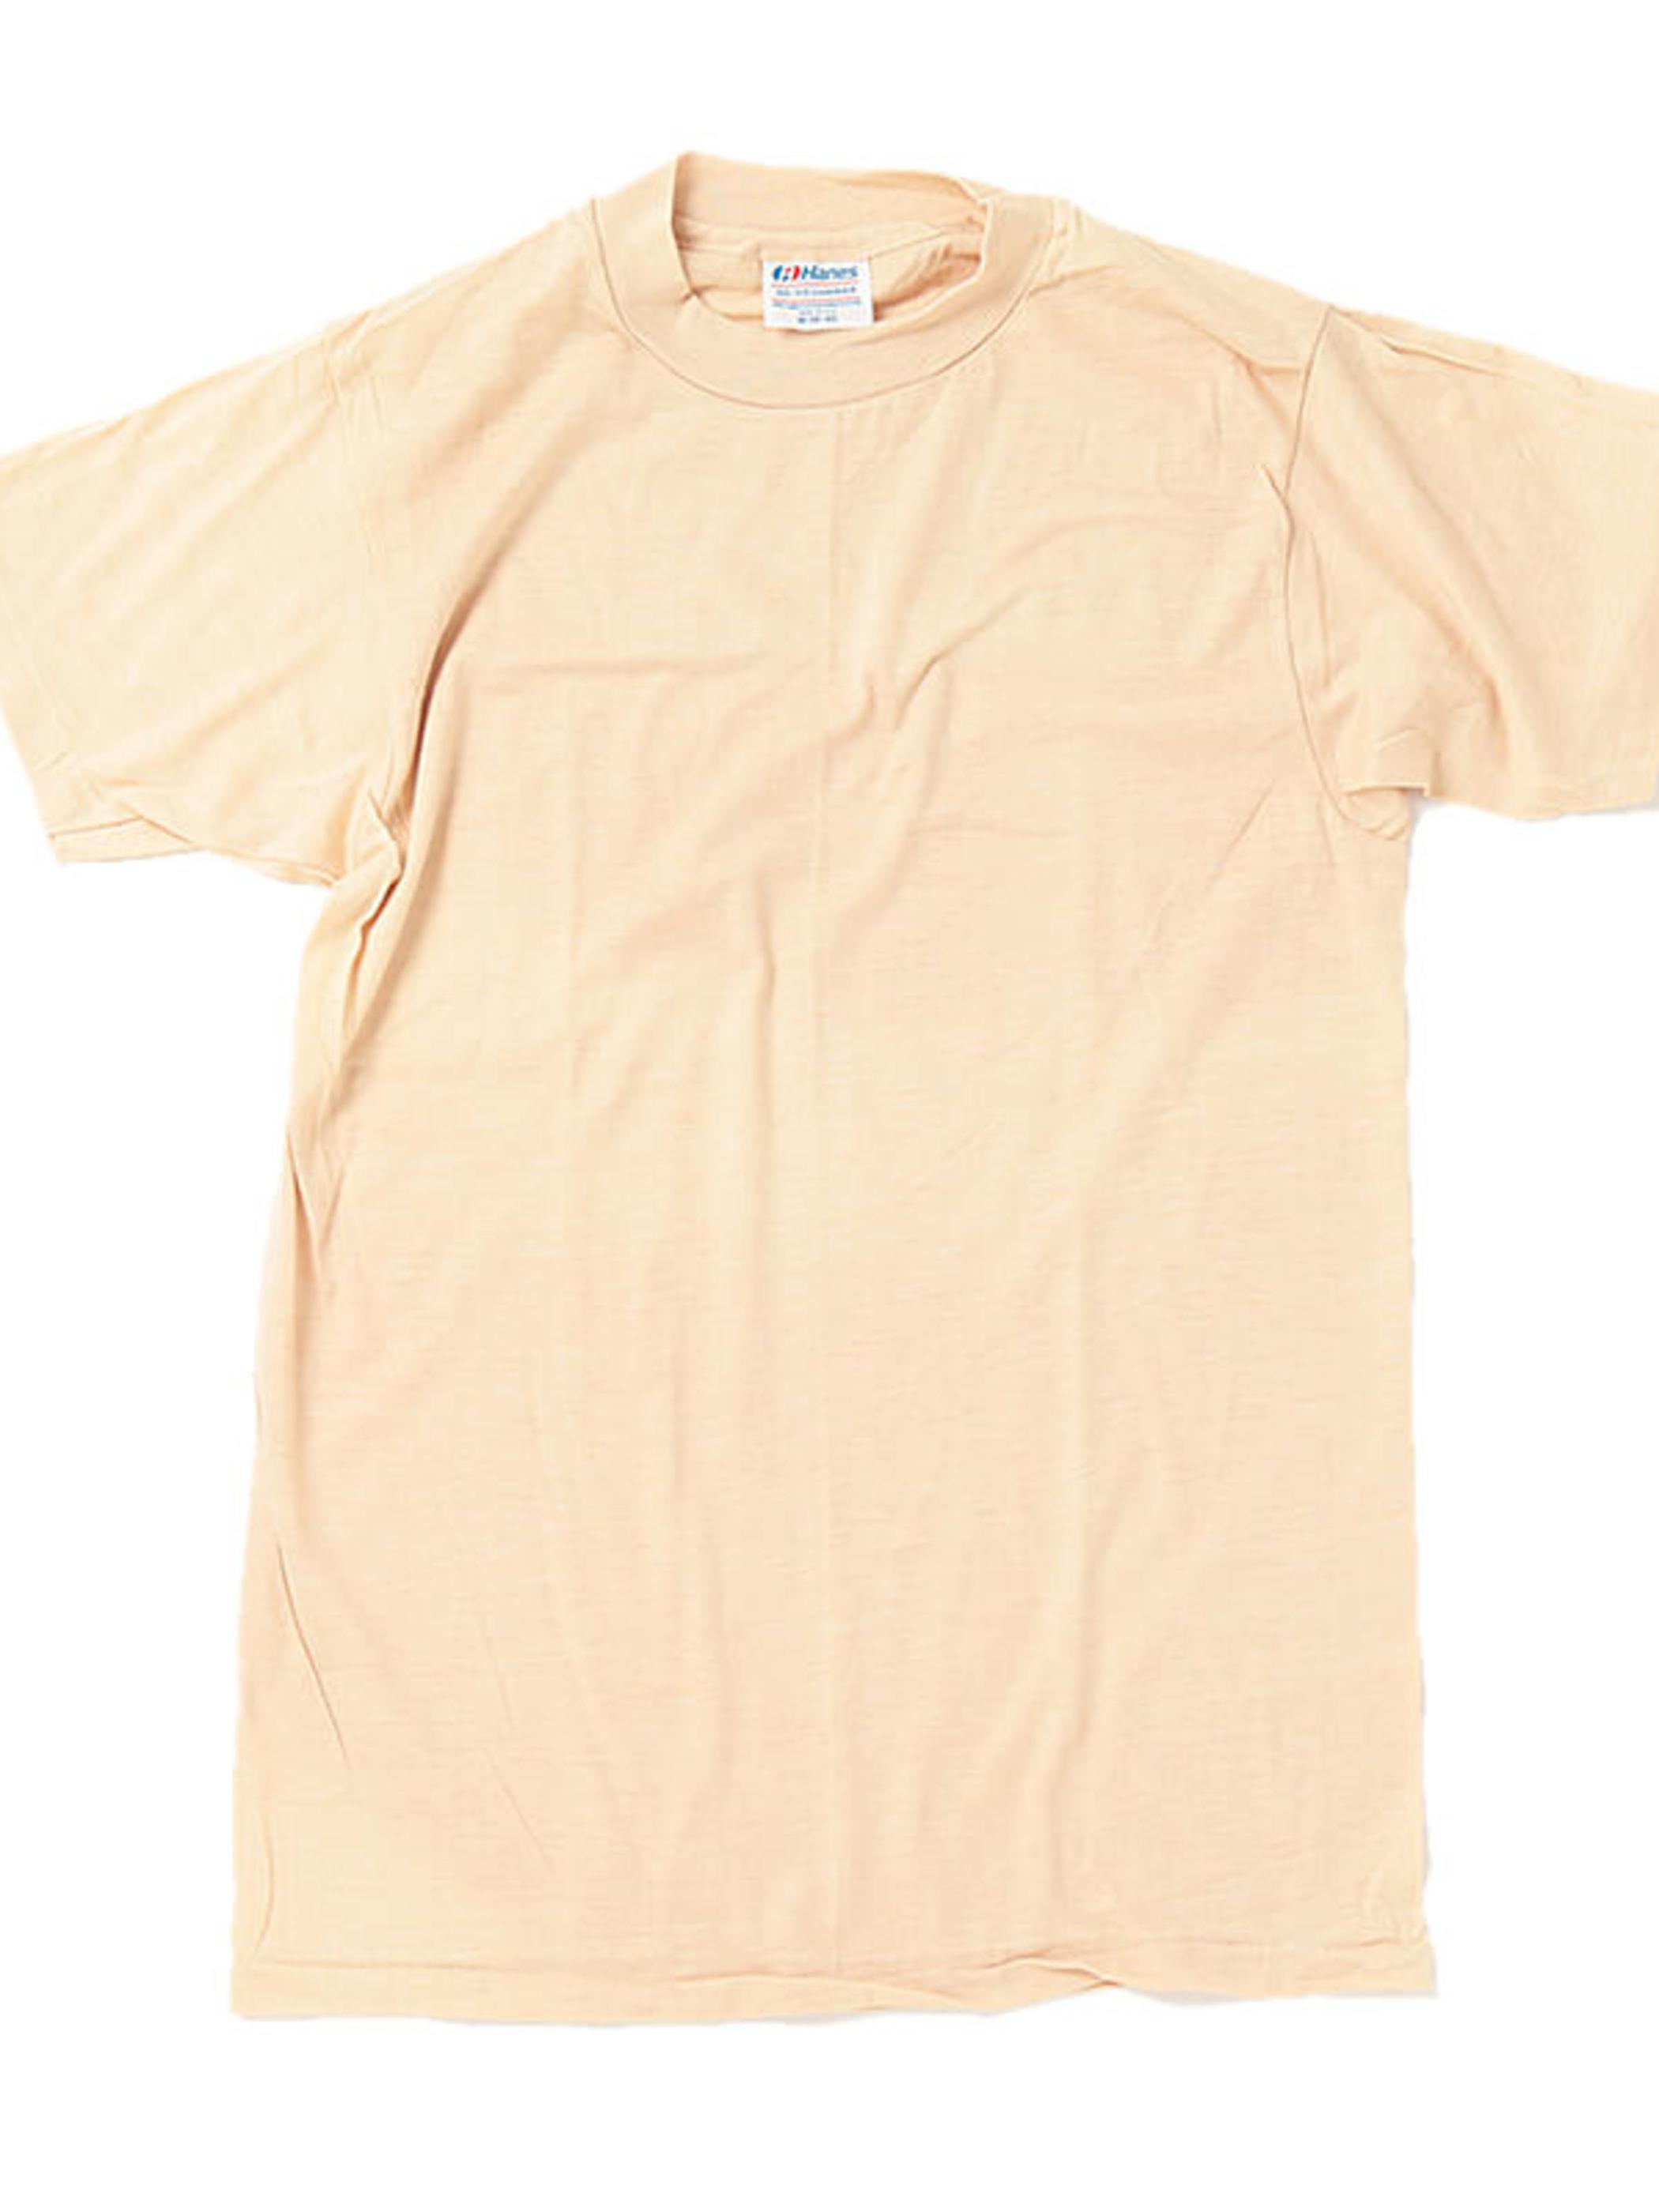 Hanes / 1980's Deadstock / T-Shirt